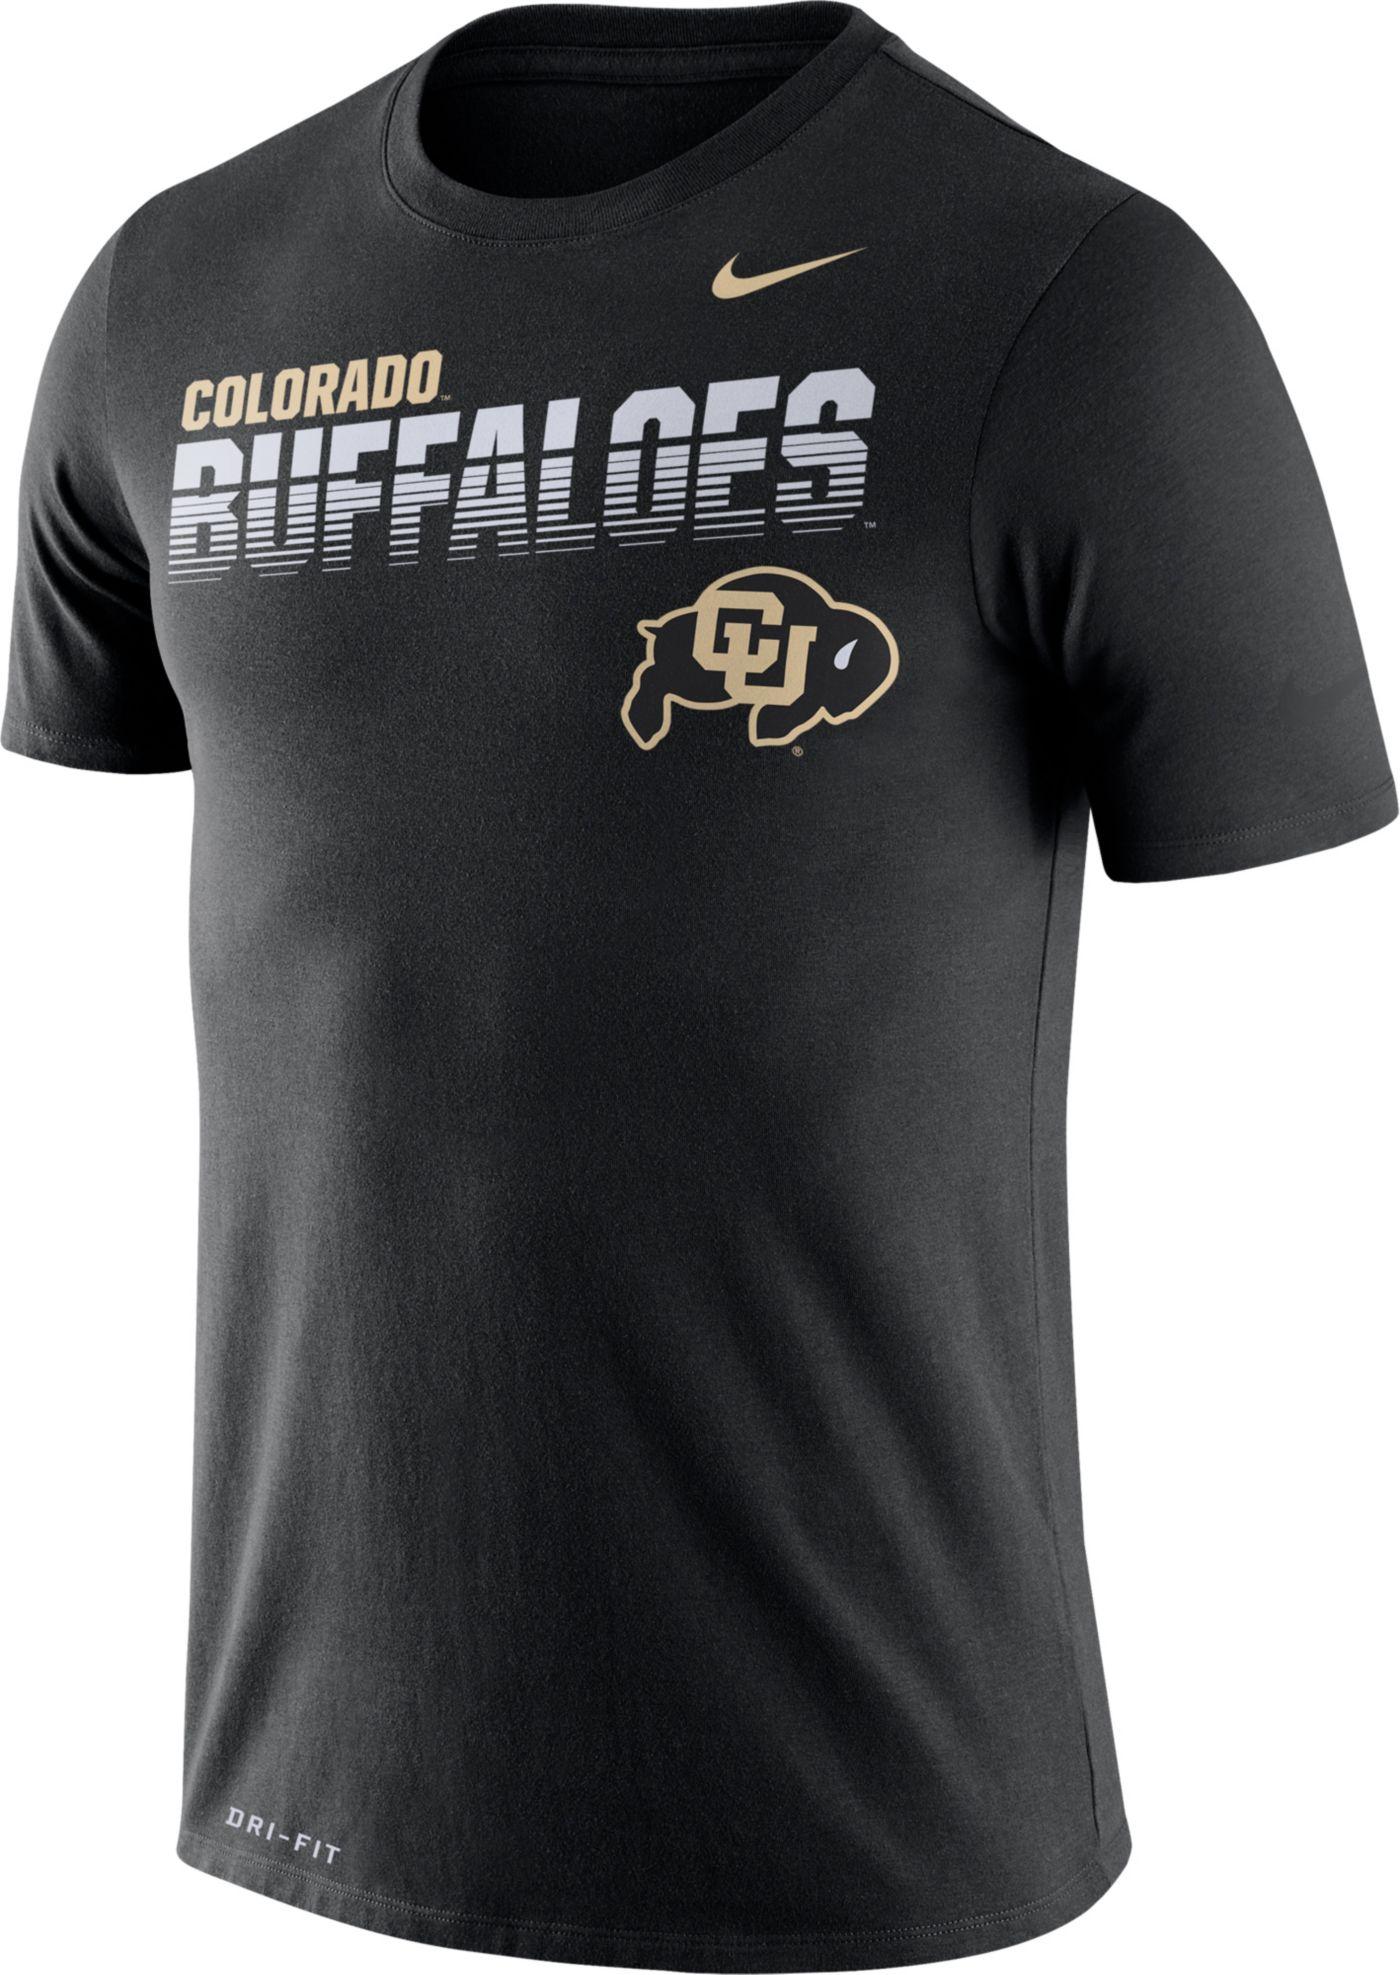 Nike Men's Colorado Buffaloes Legend Football Sideline Black T-Shirt